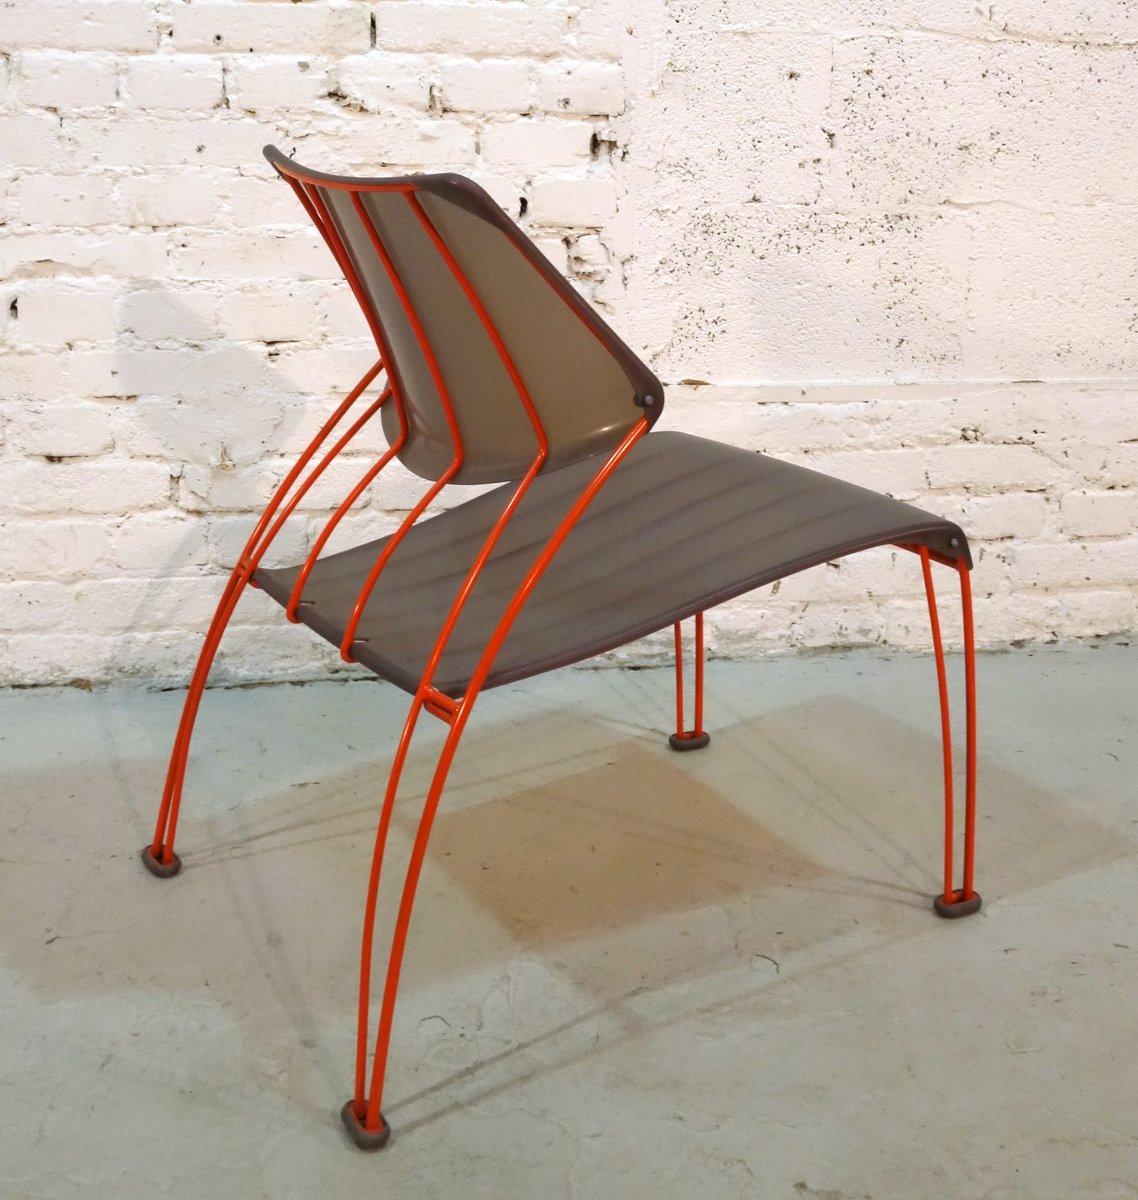 ps hasslo st hle von monika mulder f r ikea 1990 bei. Black Bedroom Furniture Sets. Home Design Ideas